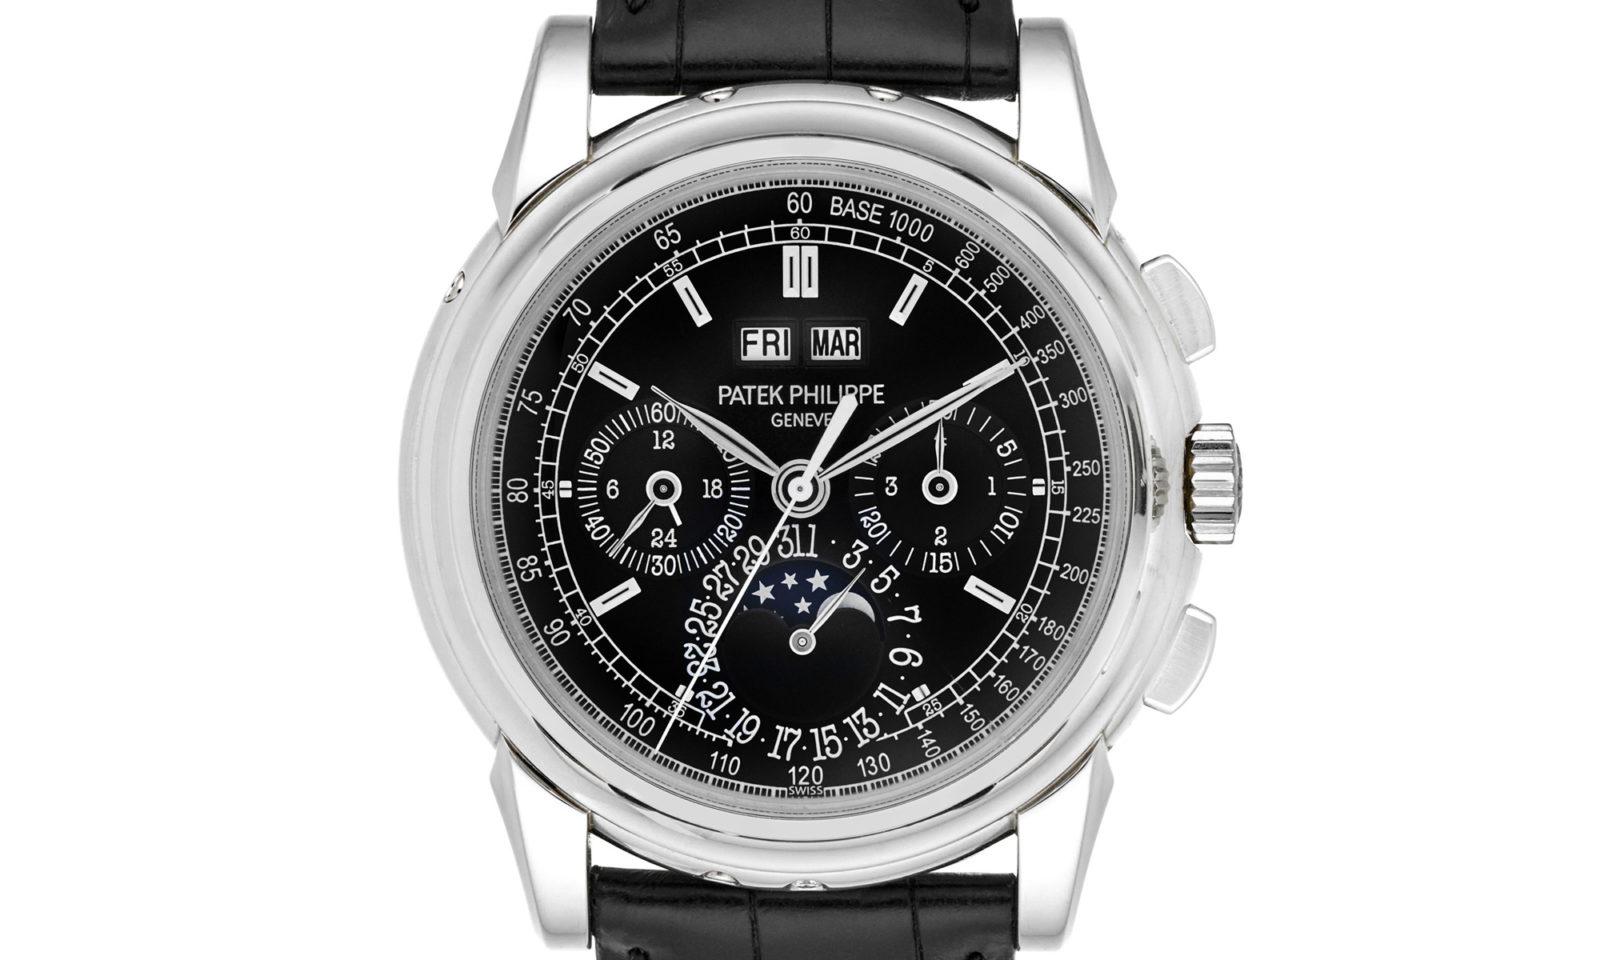 7 Patek Philippe Perpetual Calendar Chronograph 33982f4828